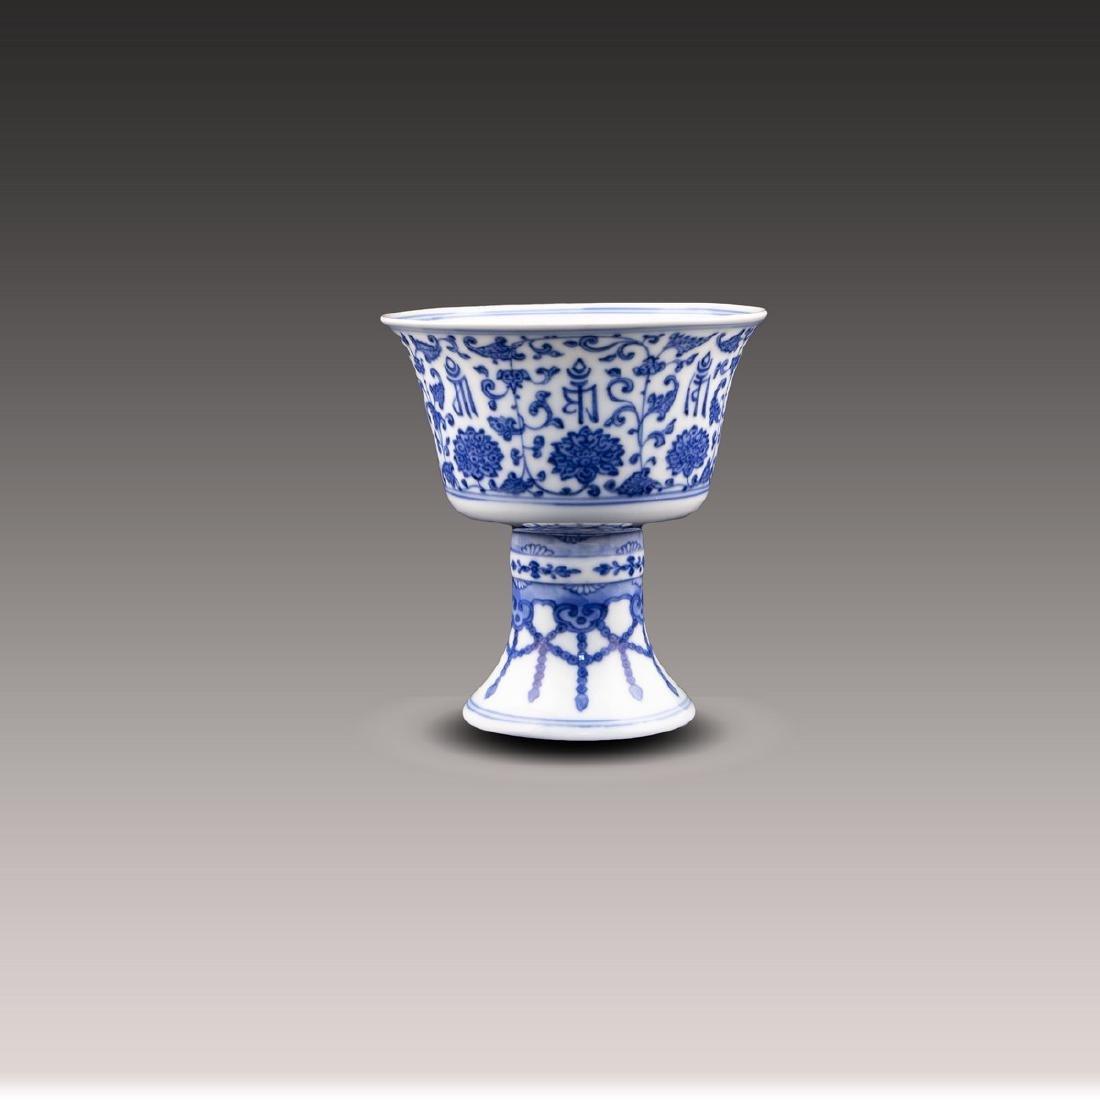 A CHINESE BLUE & WHITE 'LANCA' STEM CUP, QIANLONG